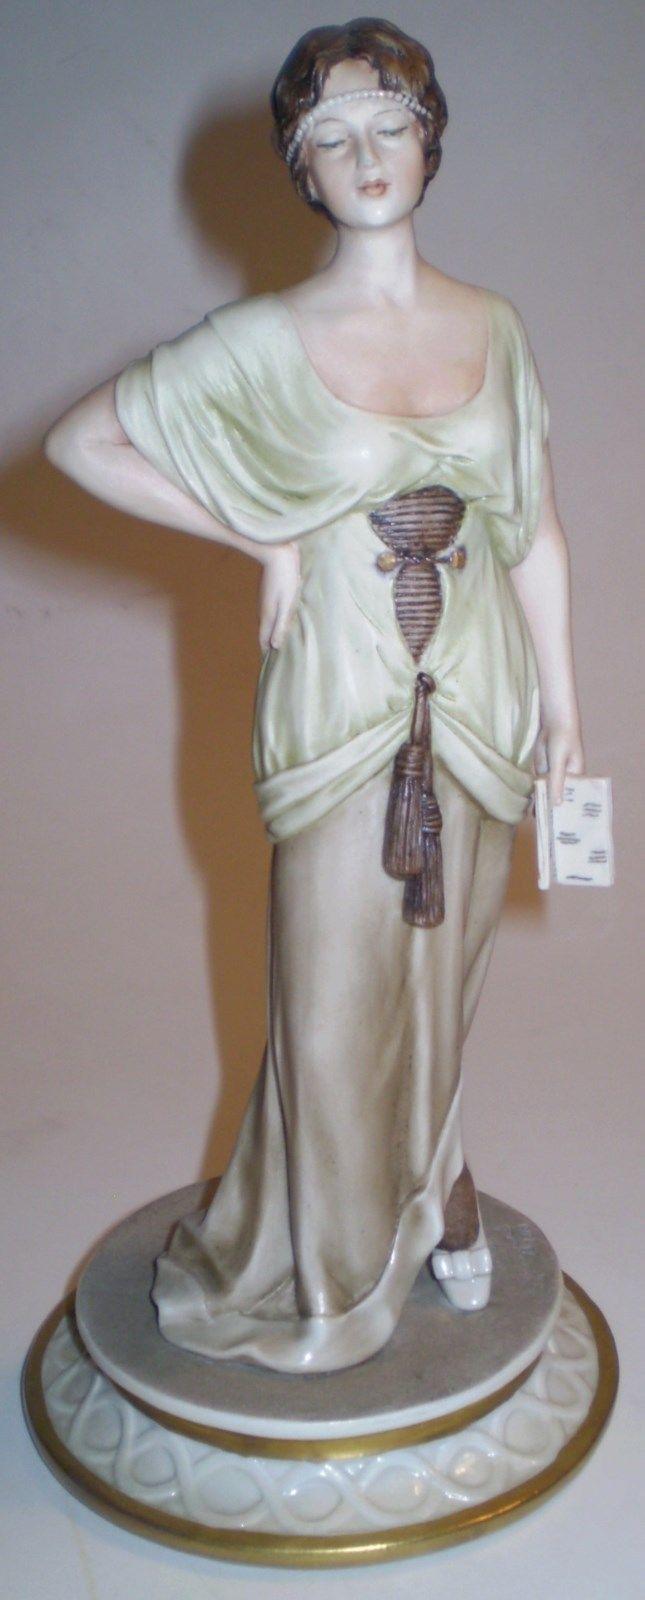 Sandro Maggioni Art Deco Lady Figurine Signed 1973 Made In